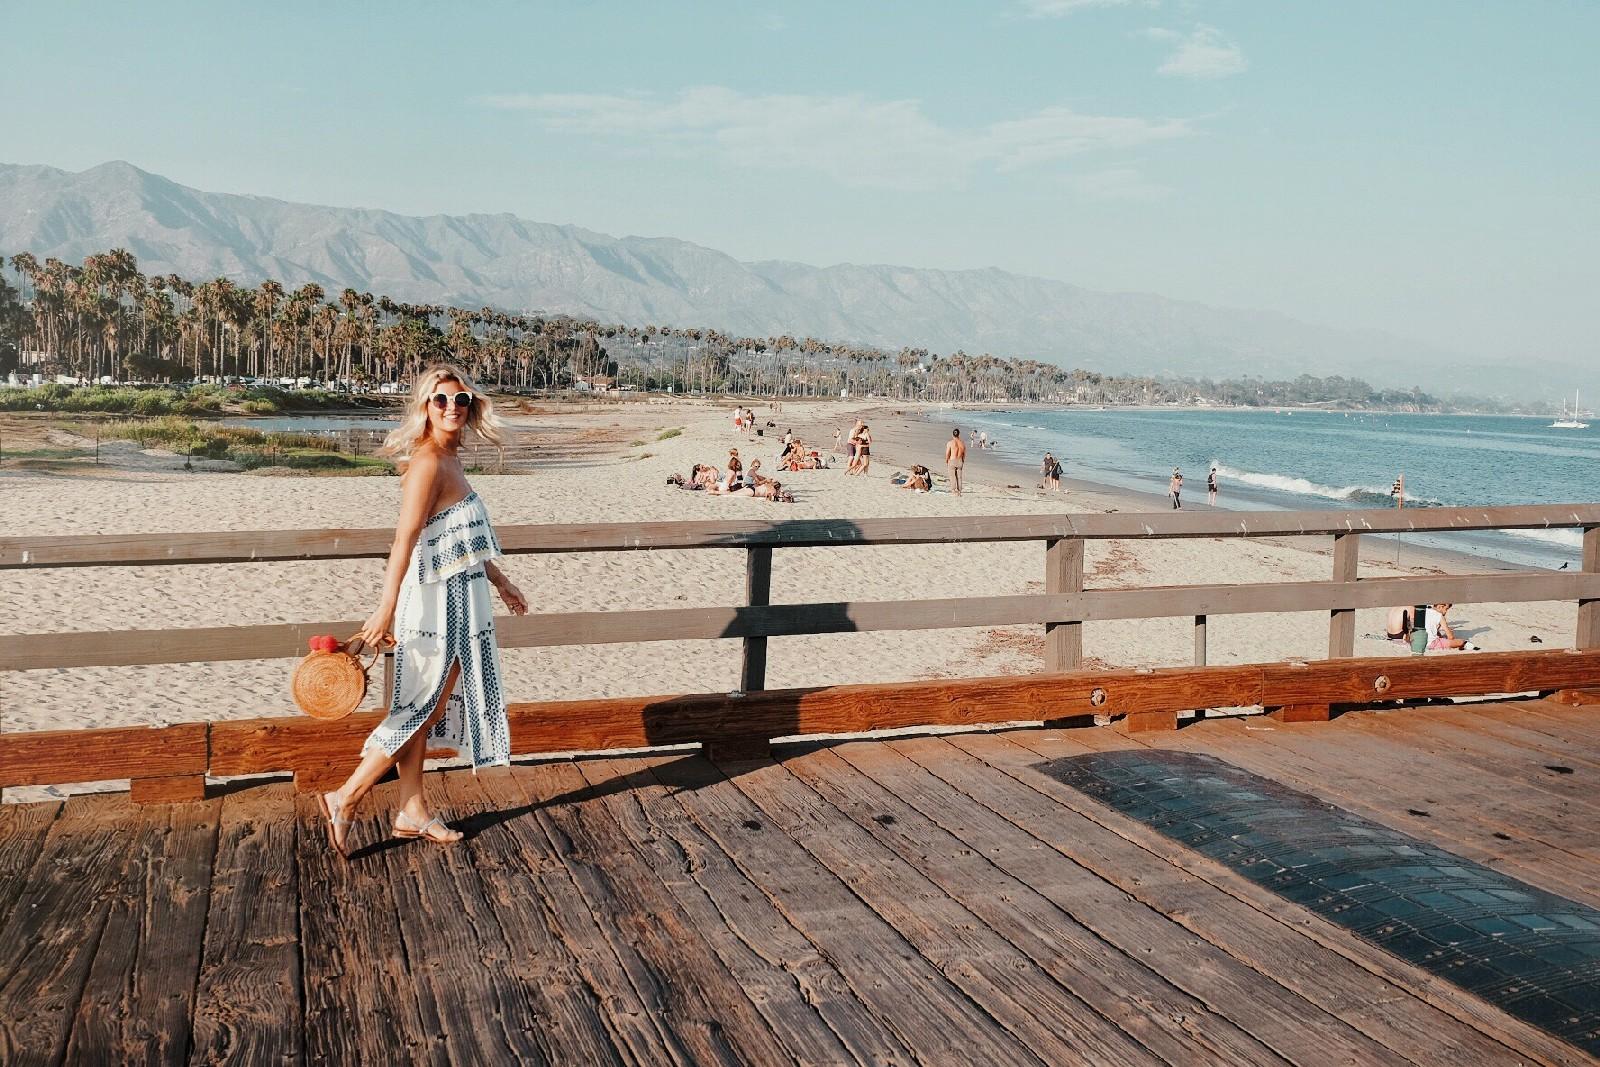 Highway 1 Road Trip - Santa Barbara Boardwalk